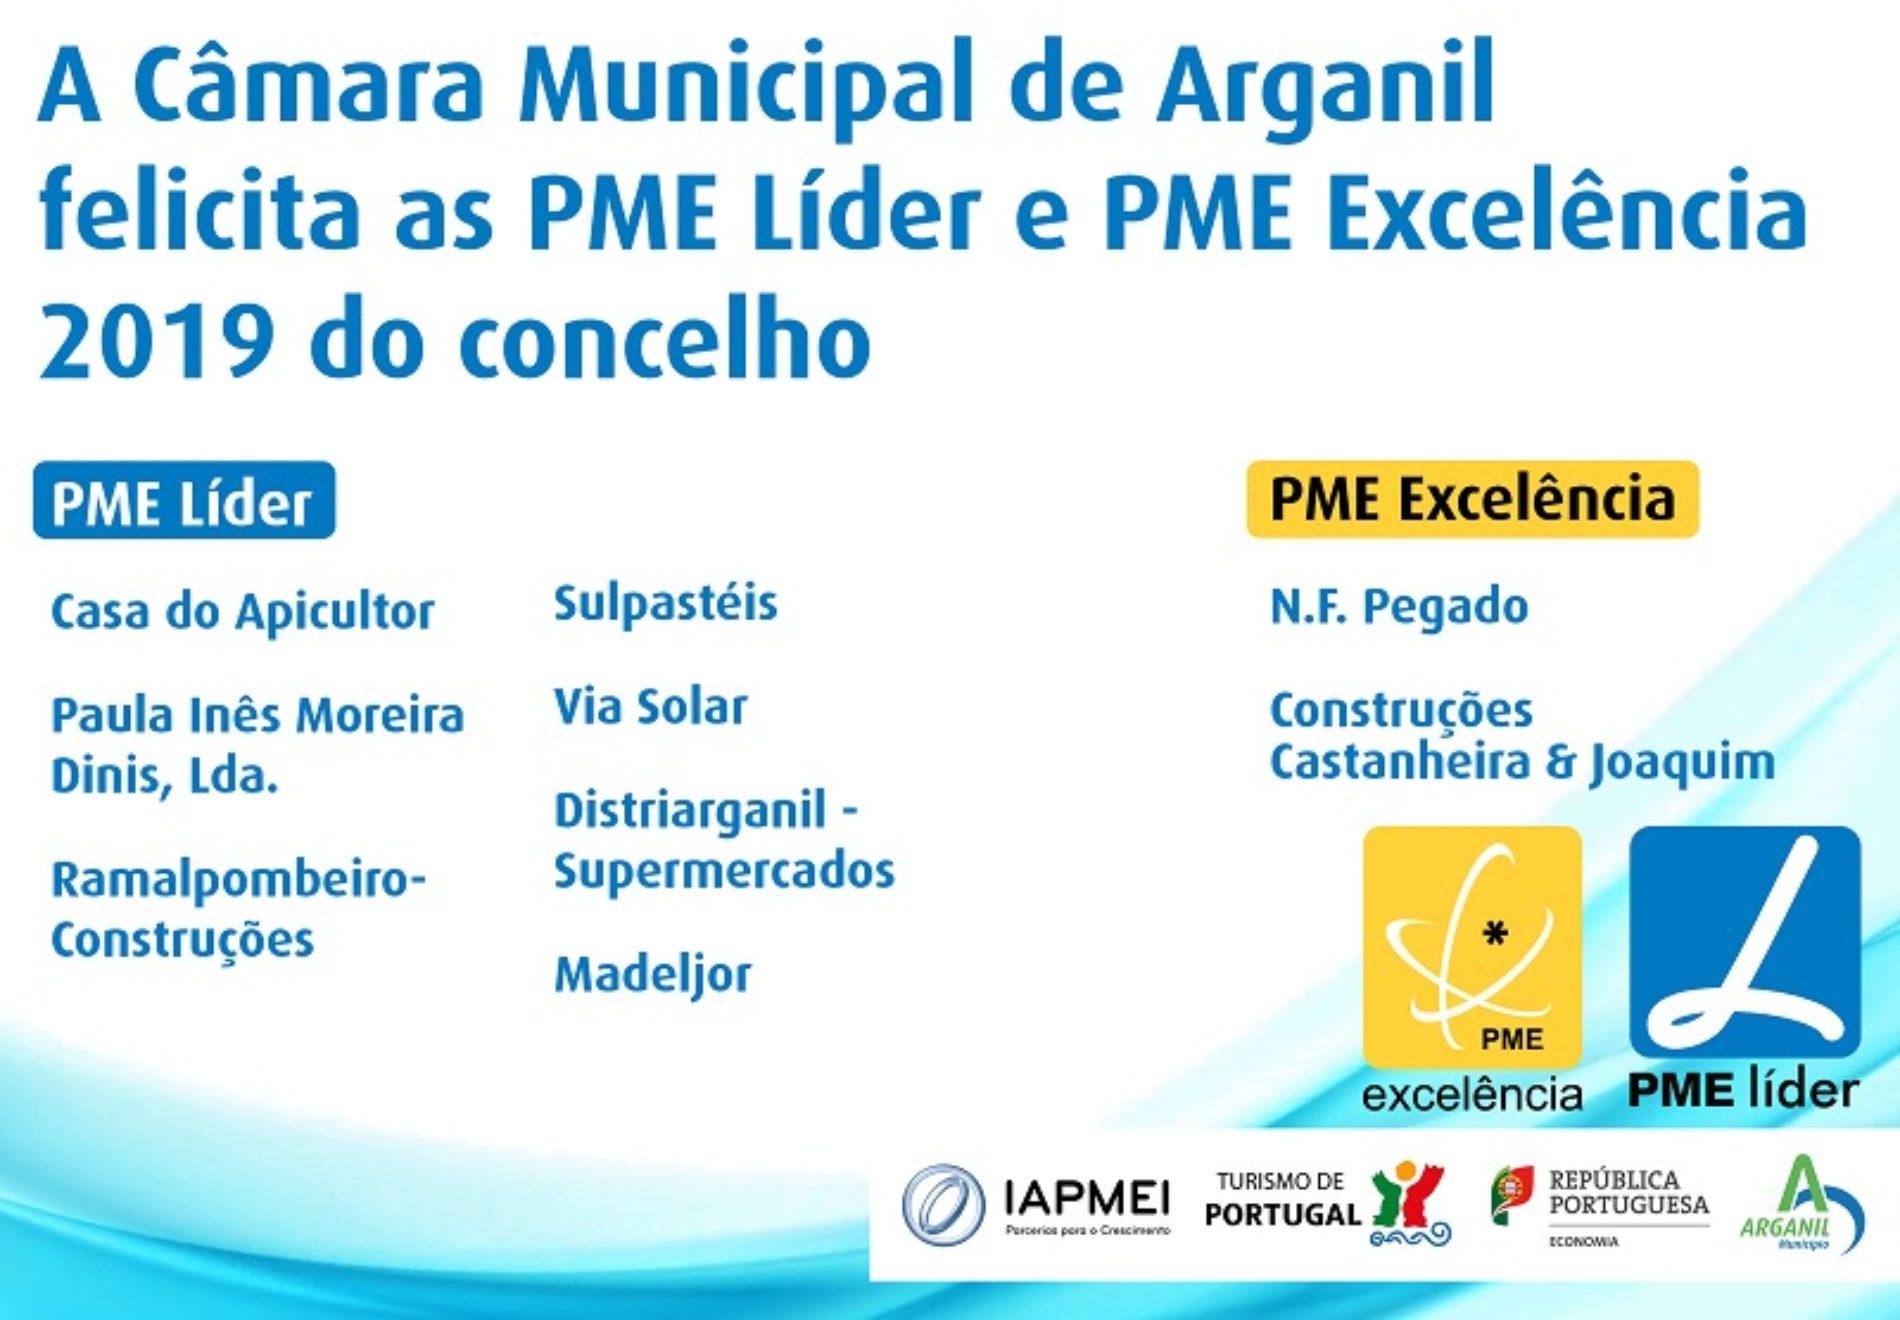 Arganil triplica número de PME Excelência e PME Líder